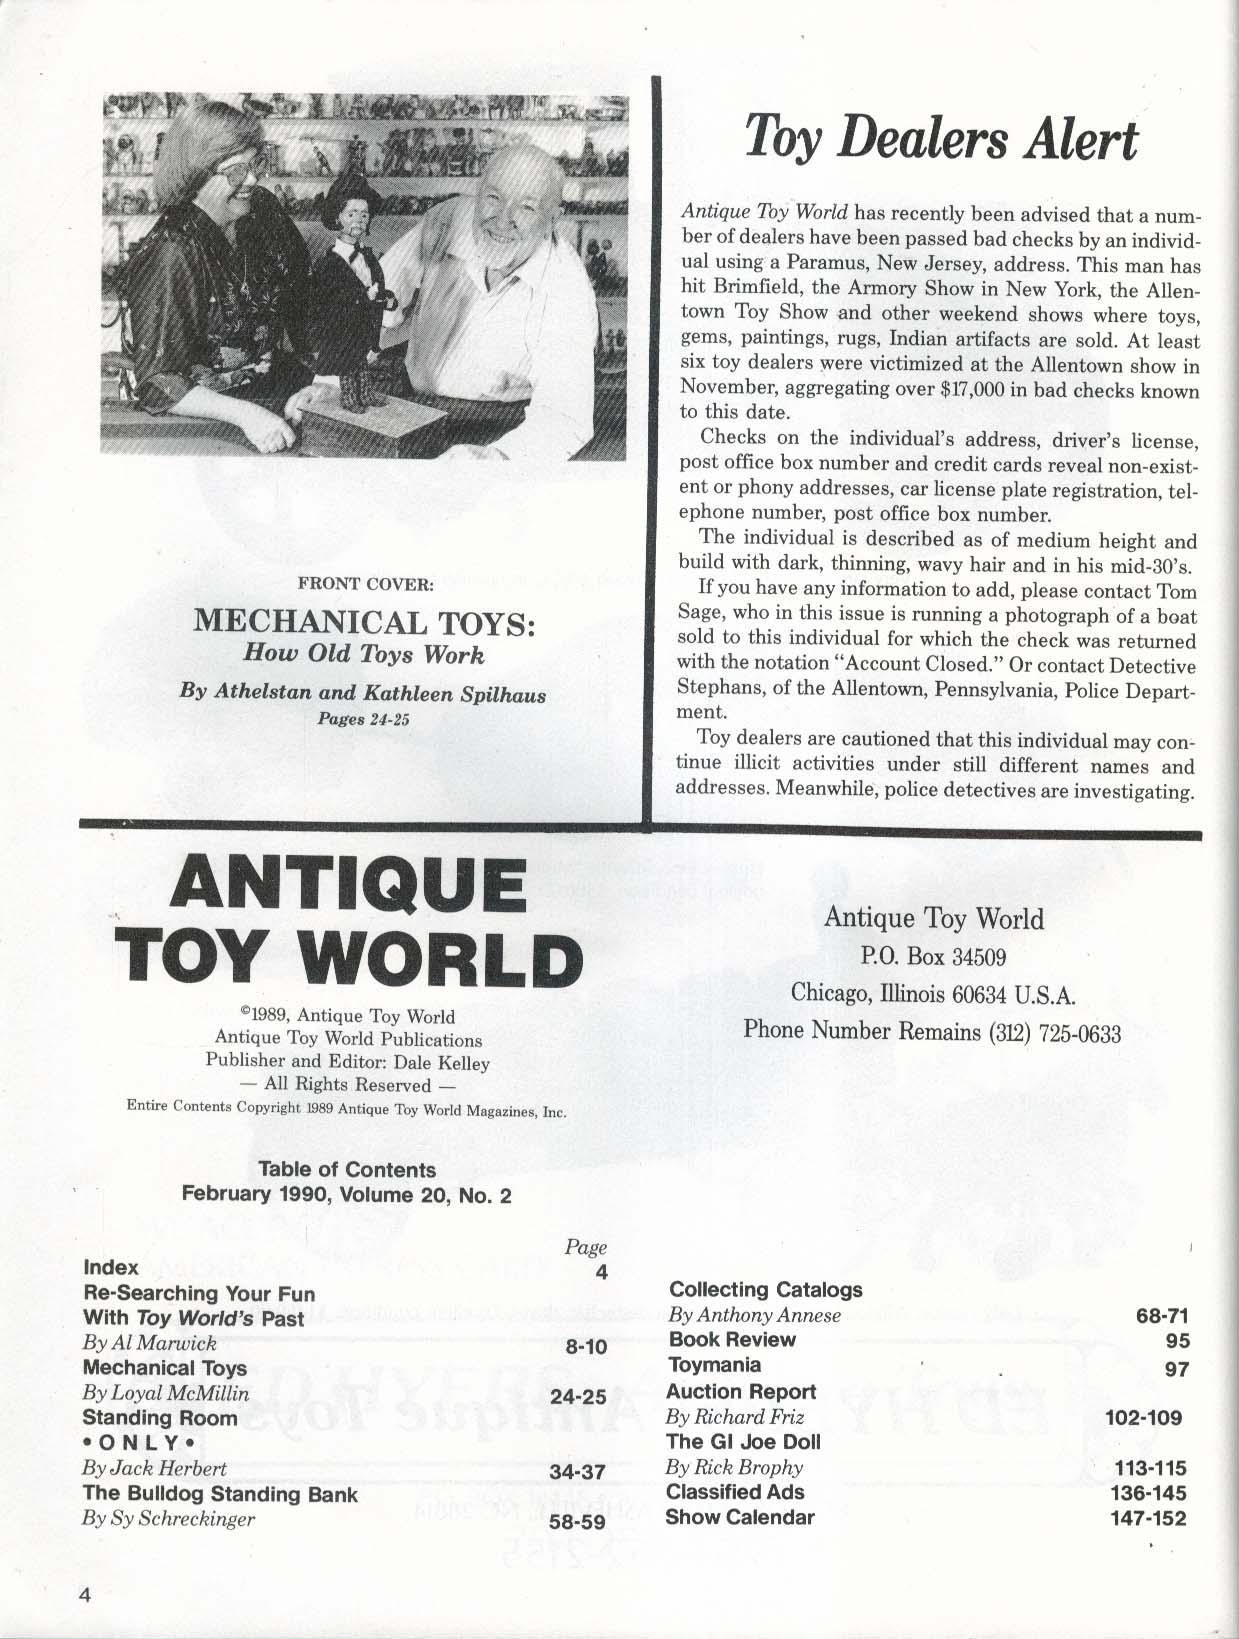 ANTIQUE TOY WORLD Mechanical Toys Bulldog Standing Bank GI Joe 2 1990